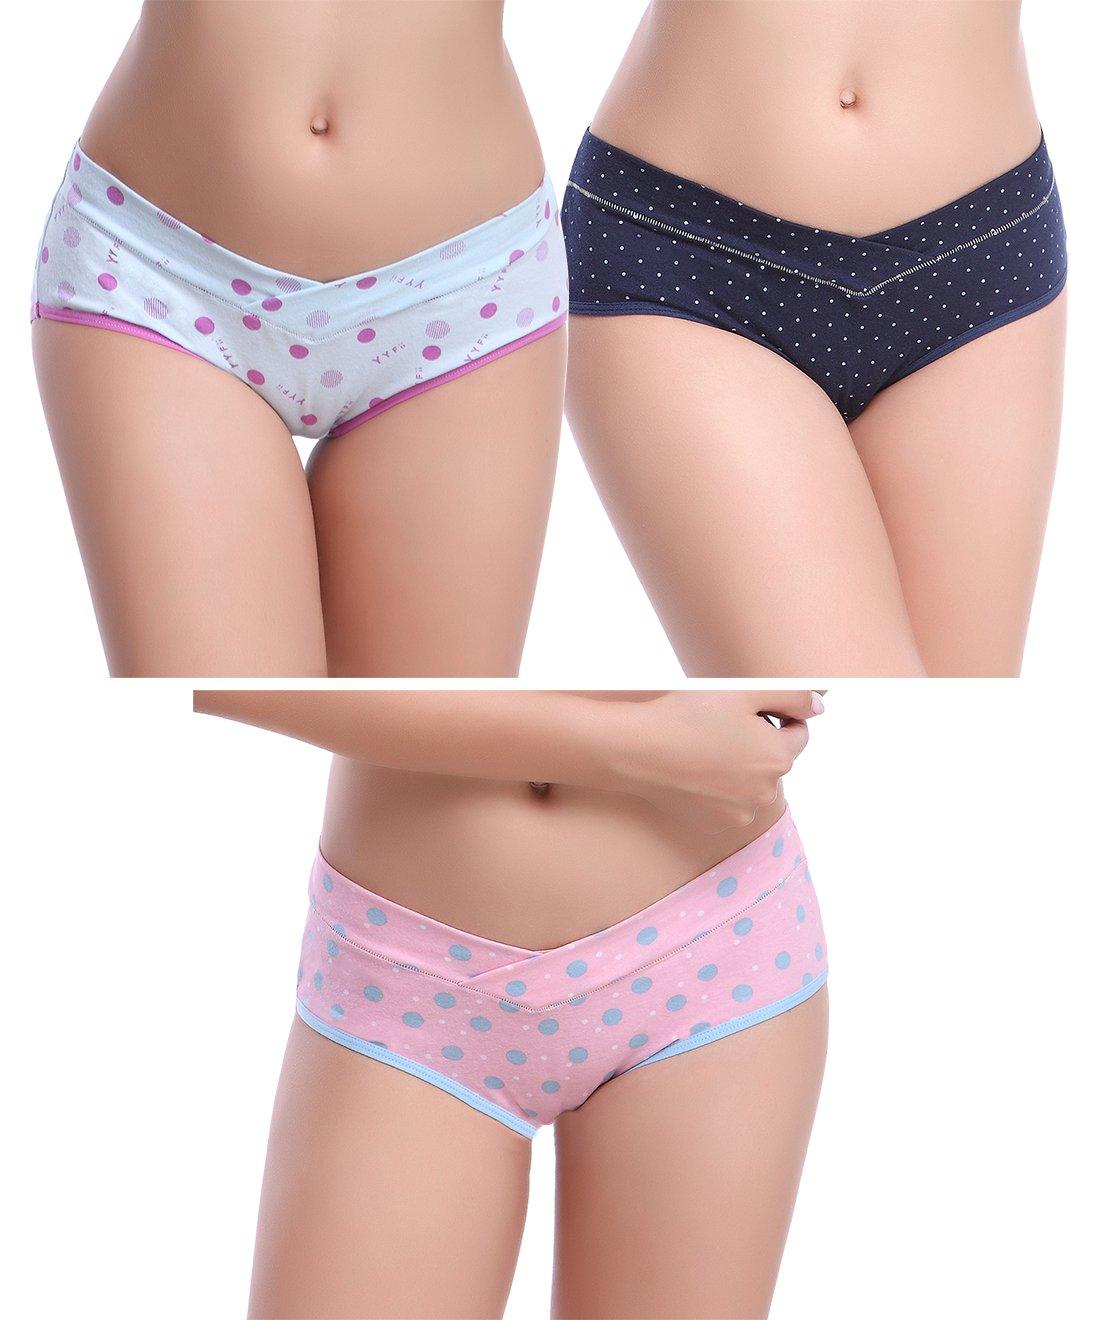 Tububa Pregnancy Underwear Set Cotton Maternity Panties For Women 3,4 Pack(Assorted Color 3 Pack,M)